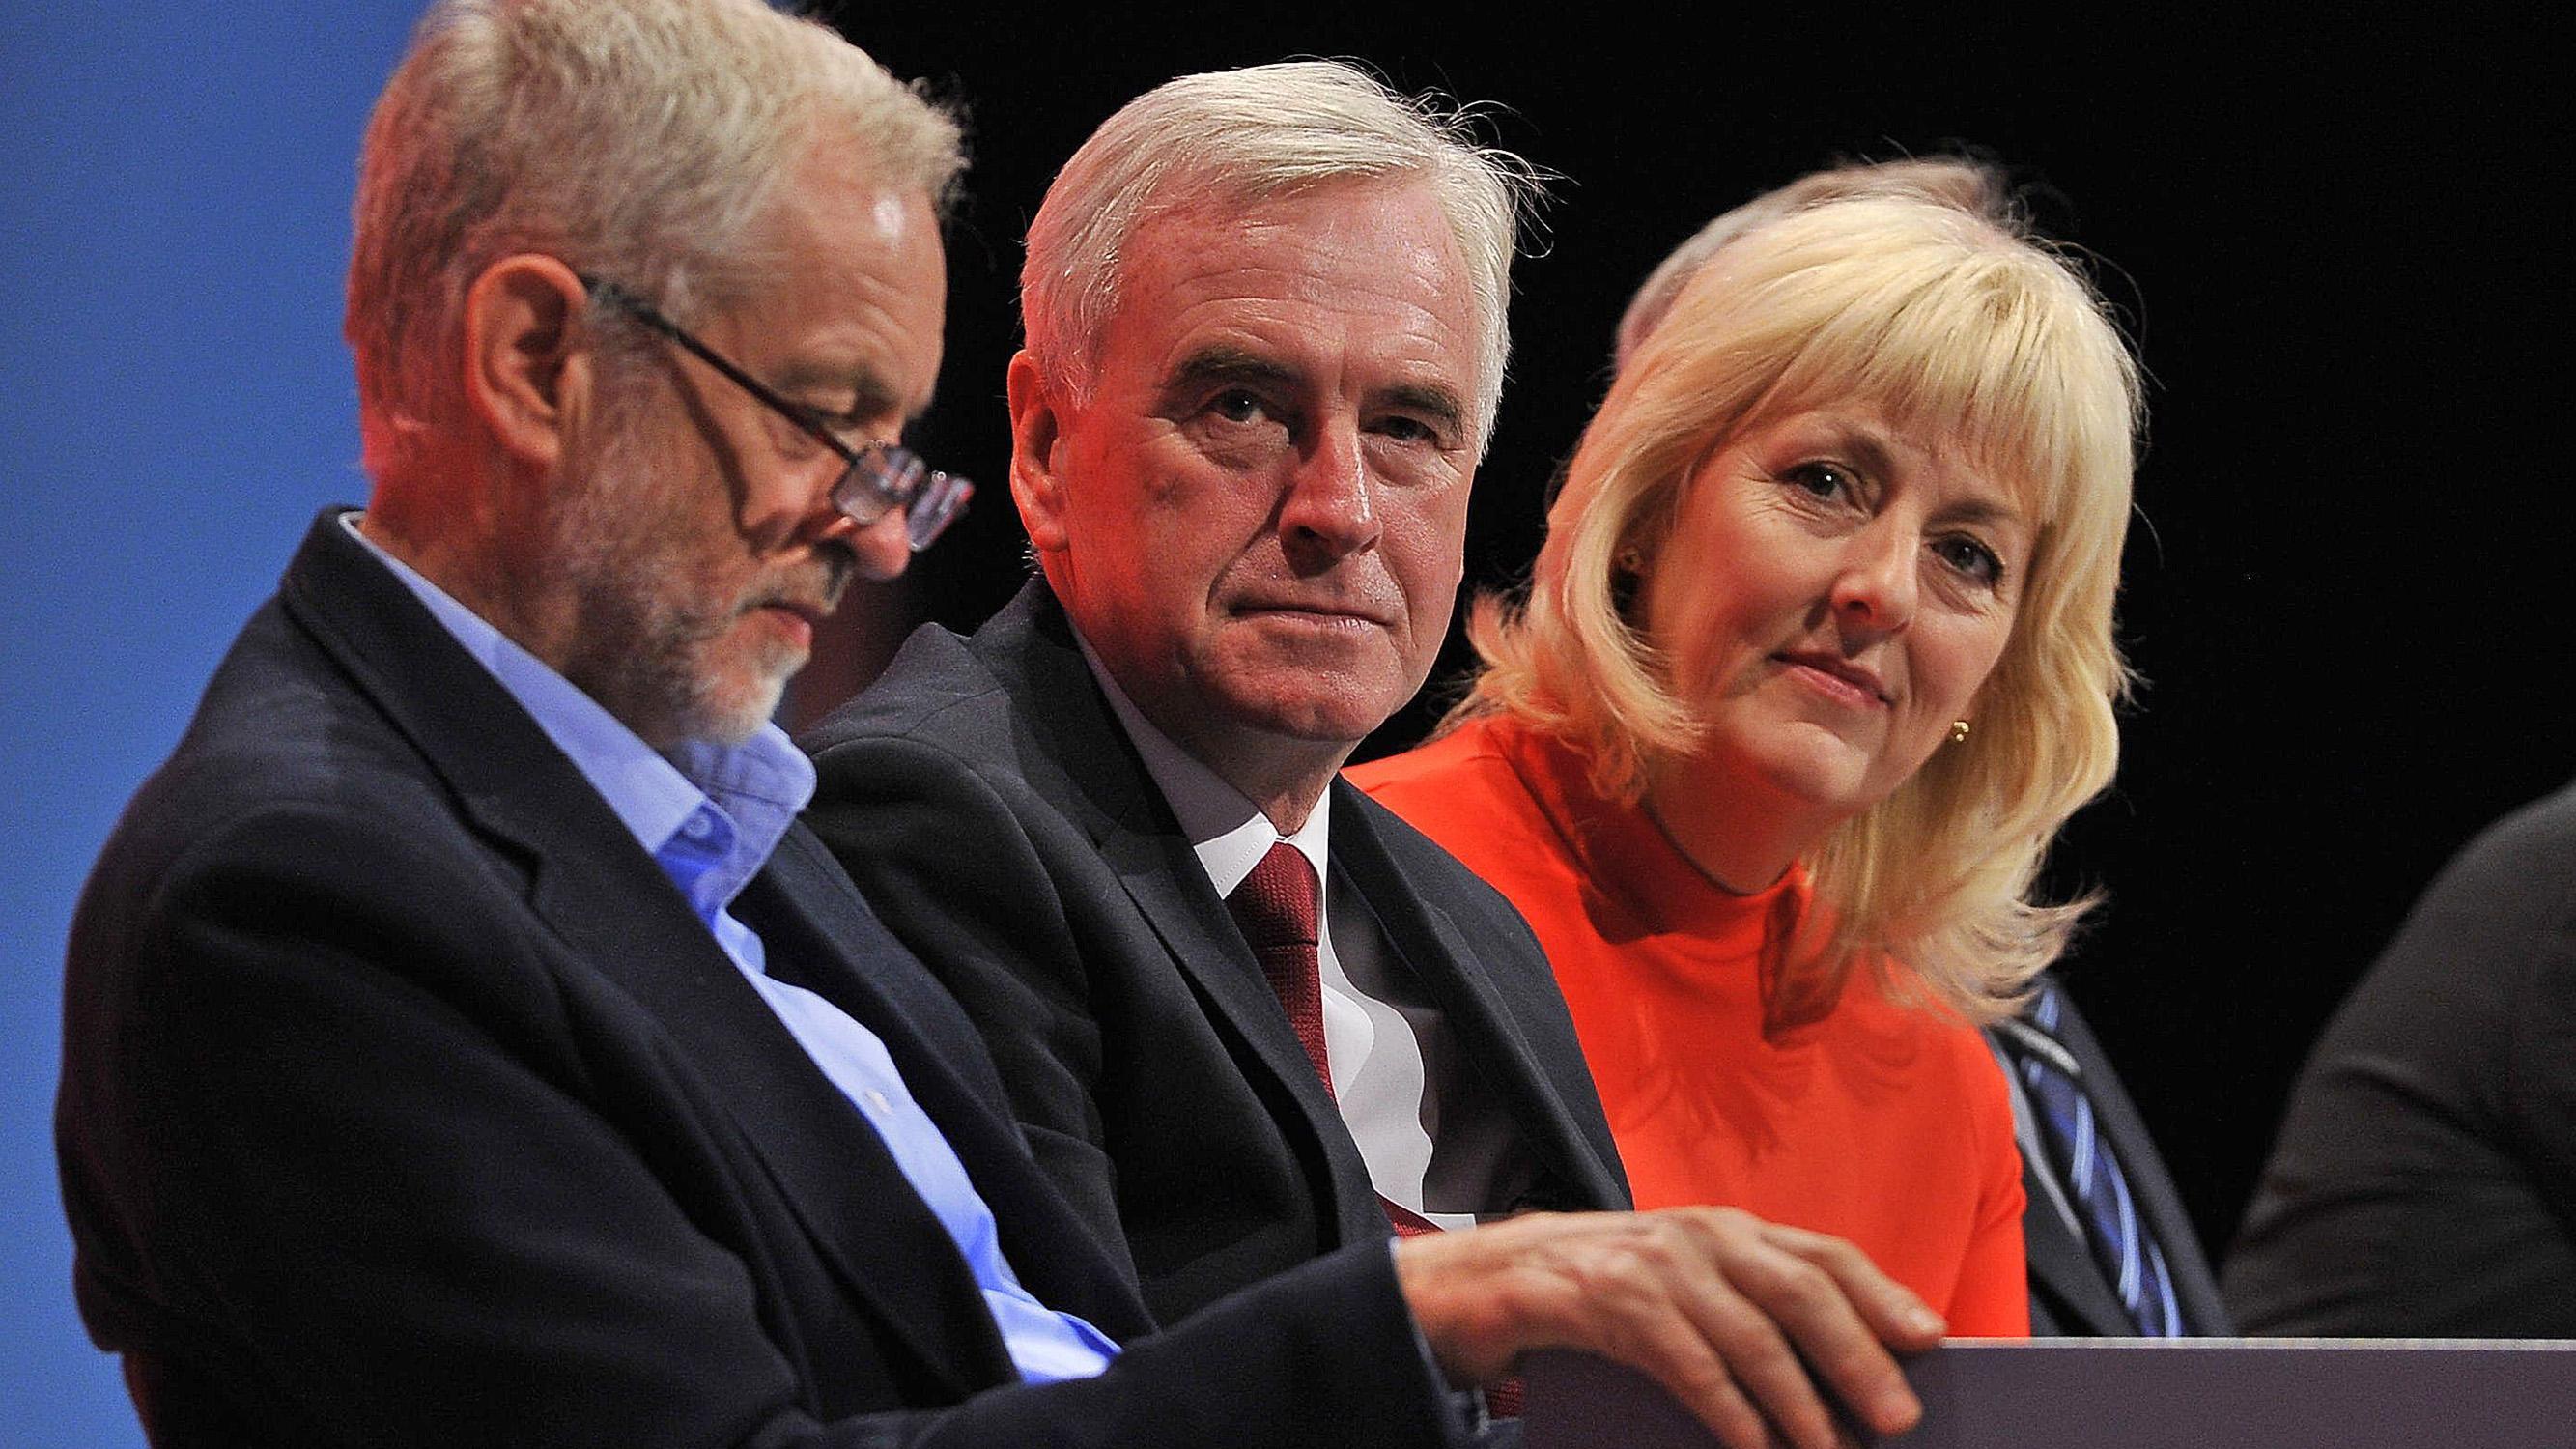 Attitude towards the current Labour leadership